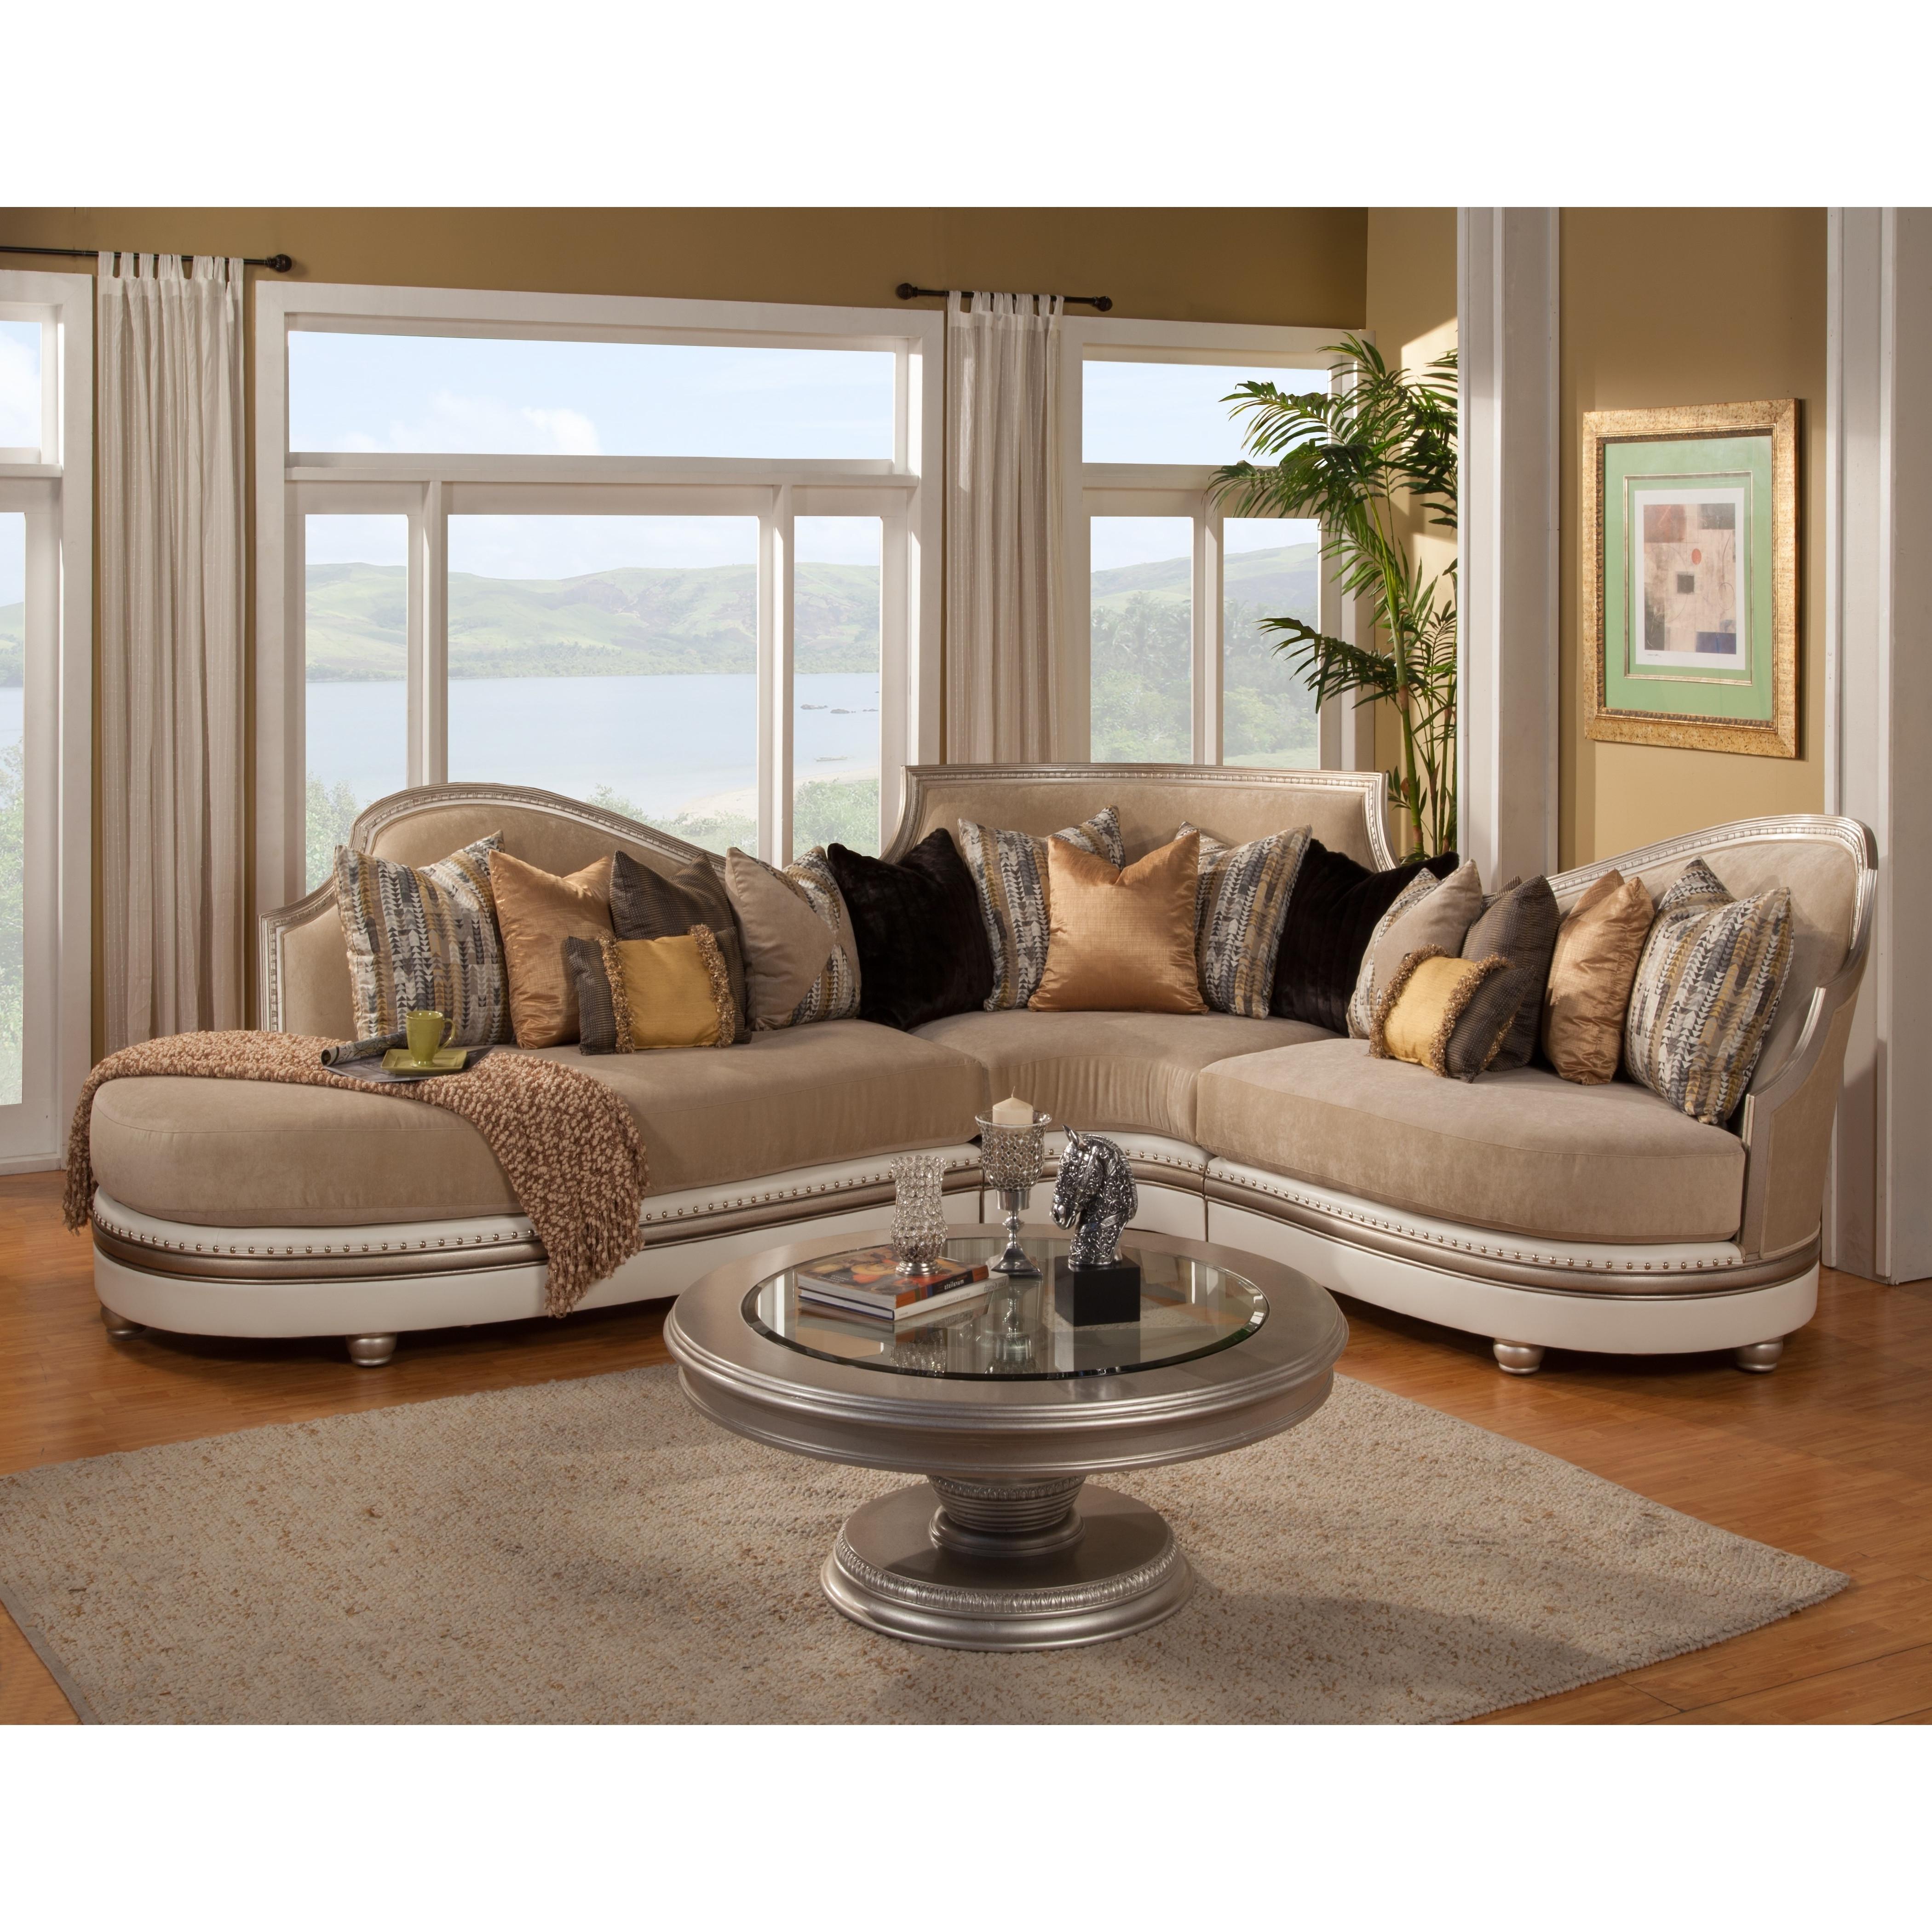 Wayfair Sectional Sofas Throughout Trendy Wayfair Sofa Sectional (View 7 of 15)